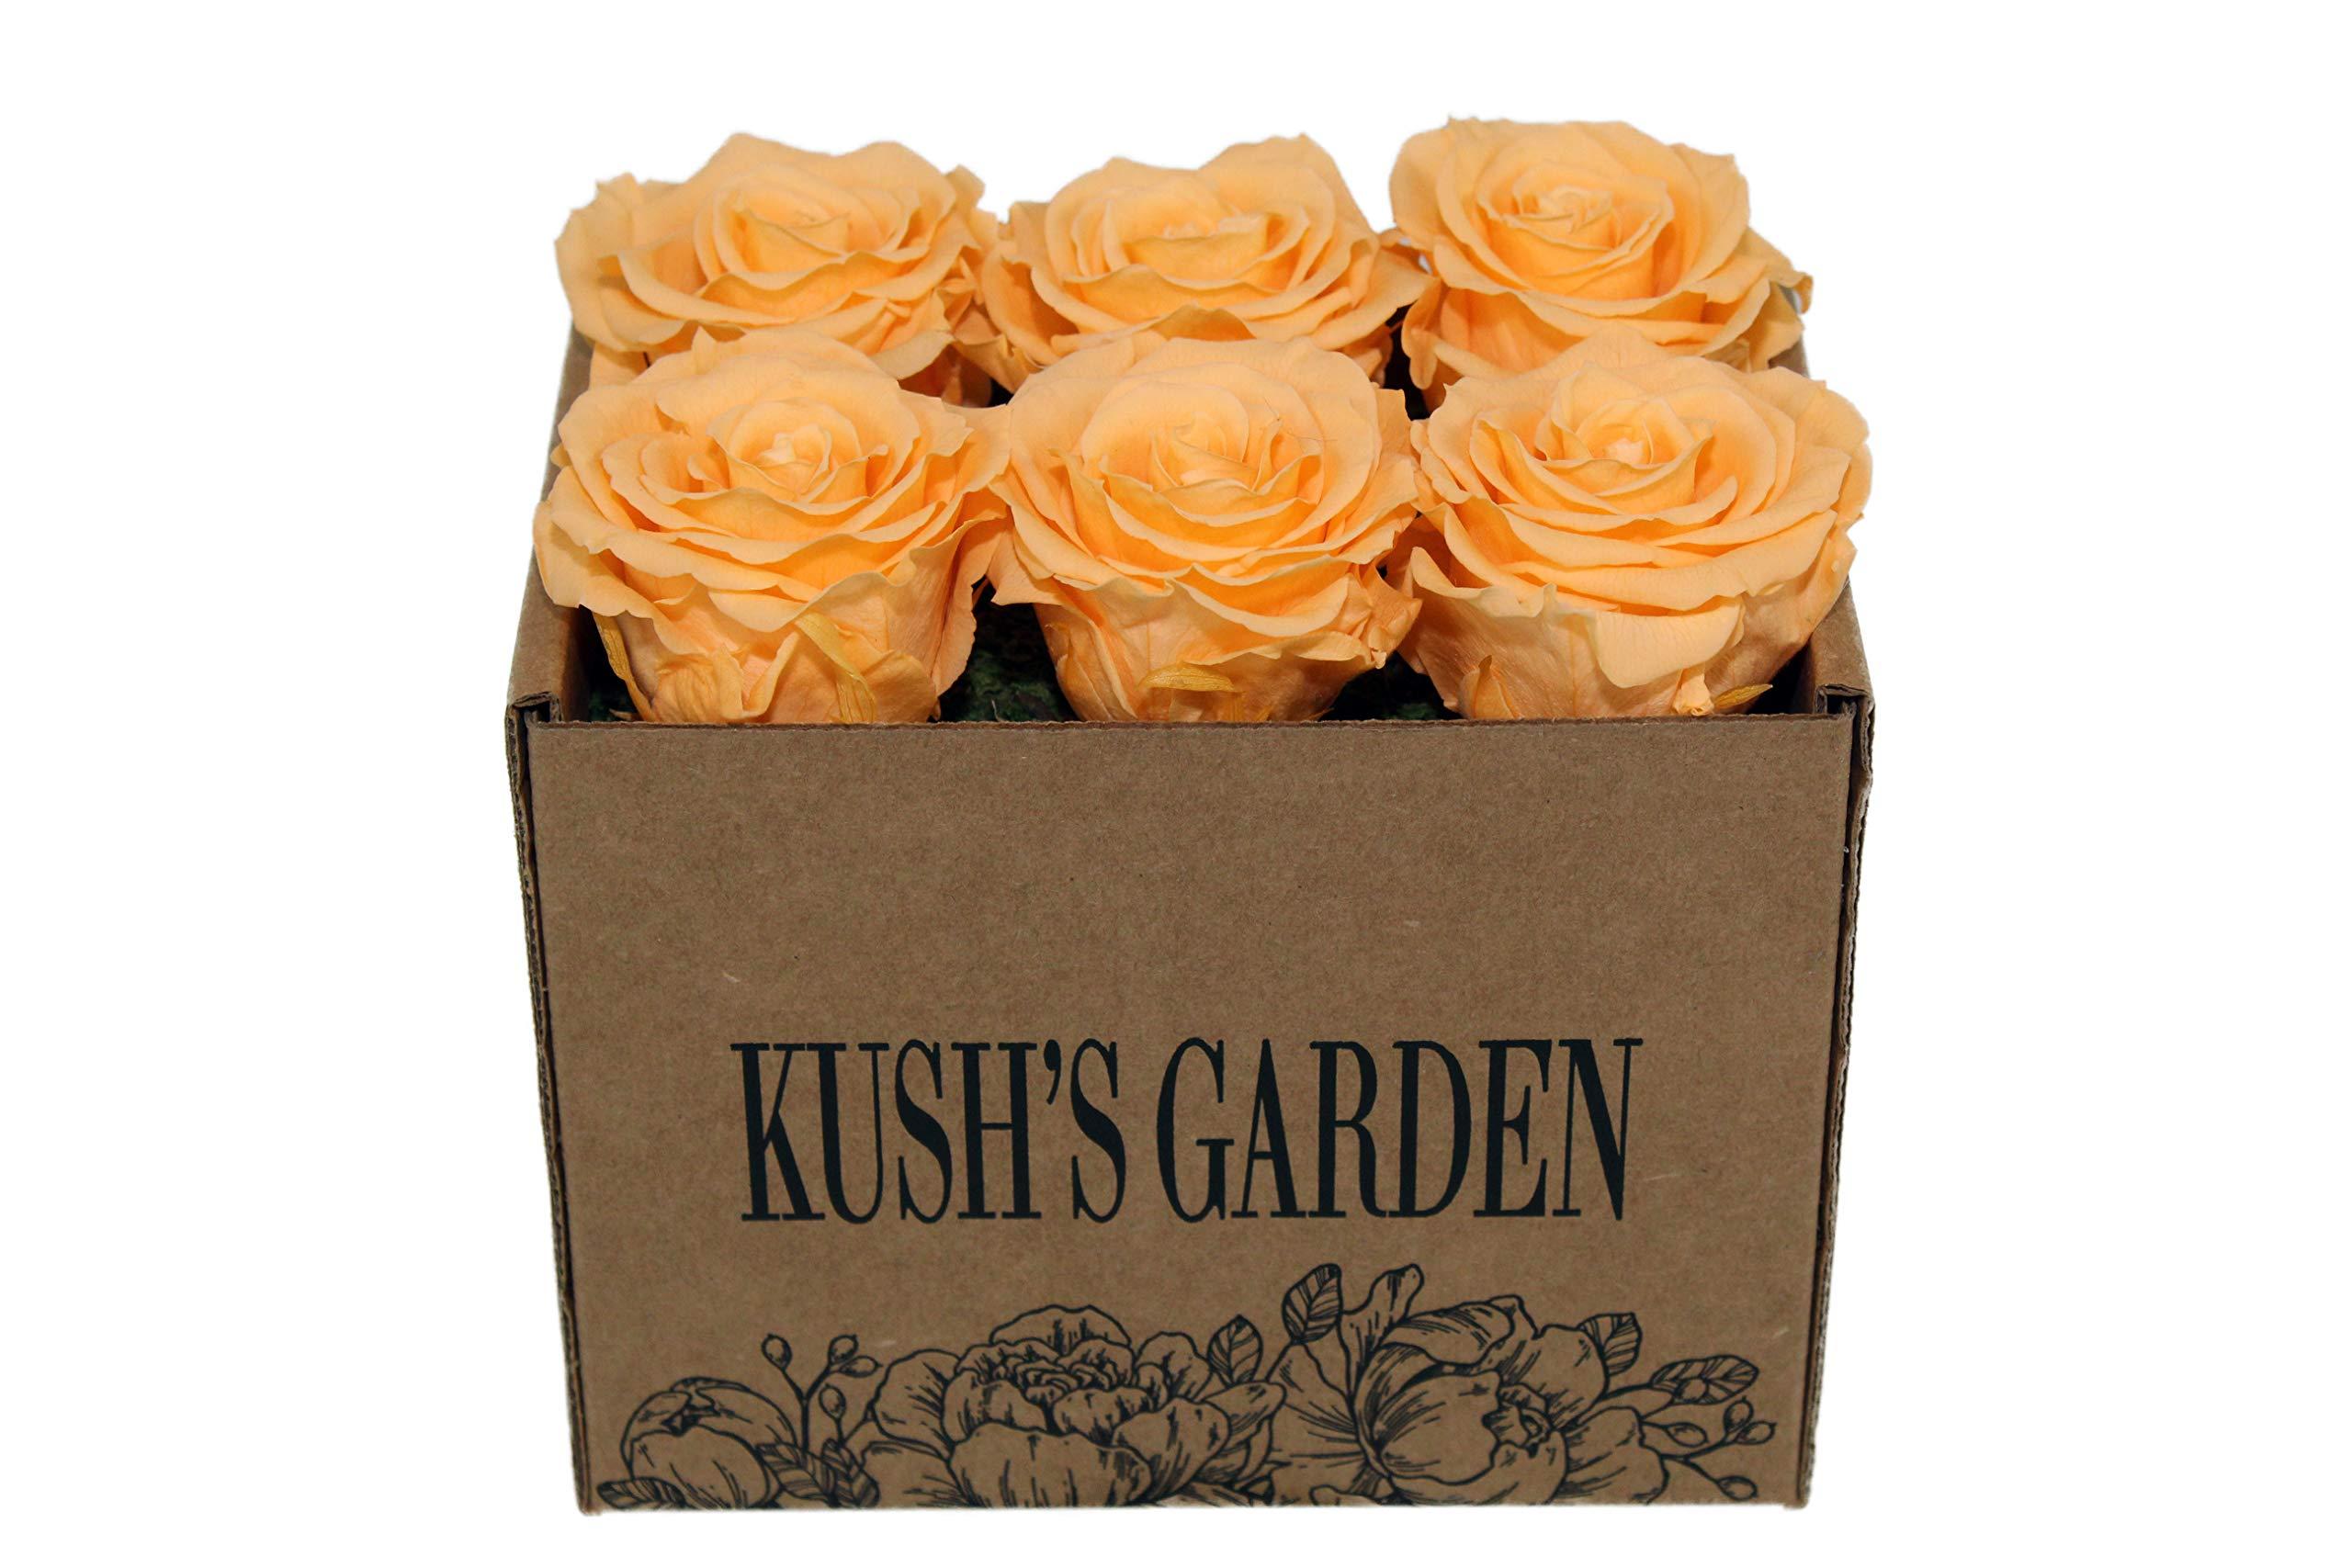 KUSHS GARDEN Real Preserved Roses in Box (Orange You Glad It's Pastel)